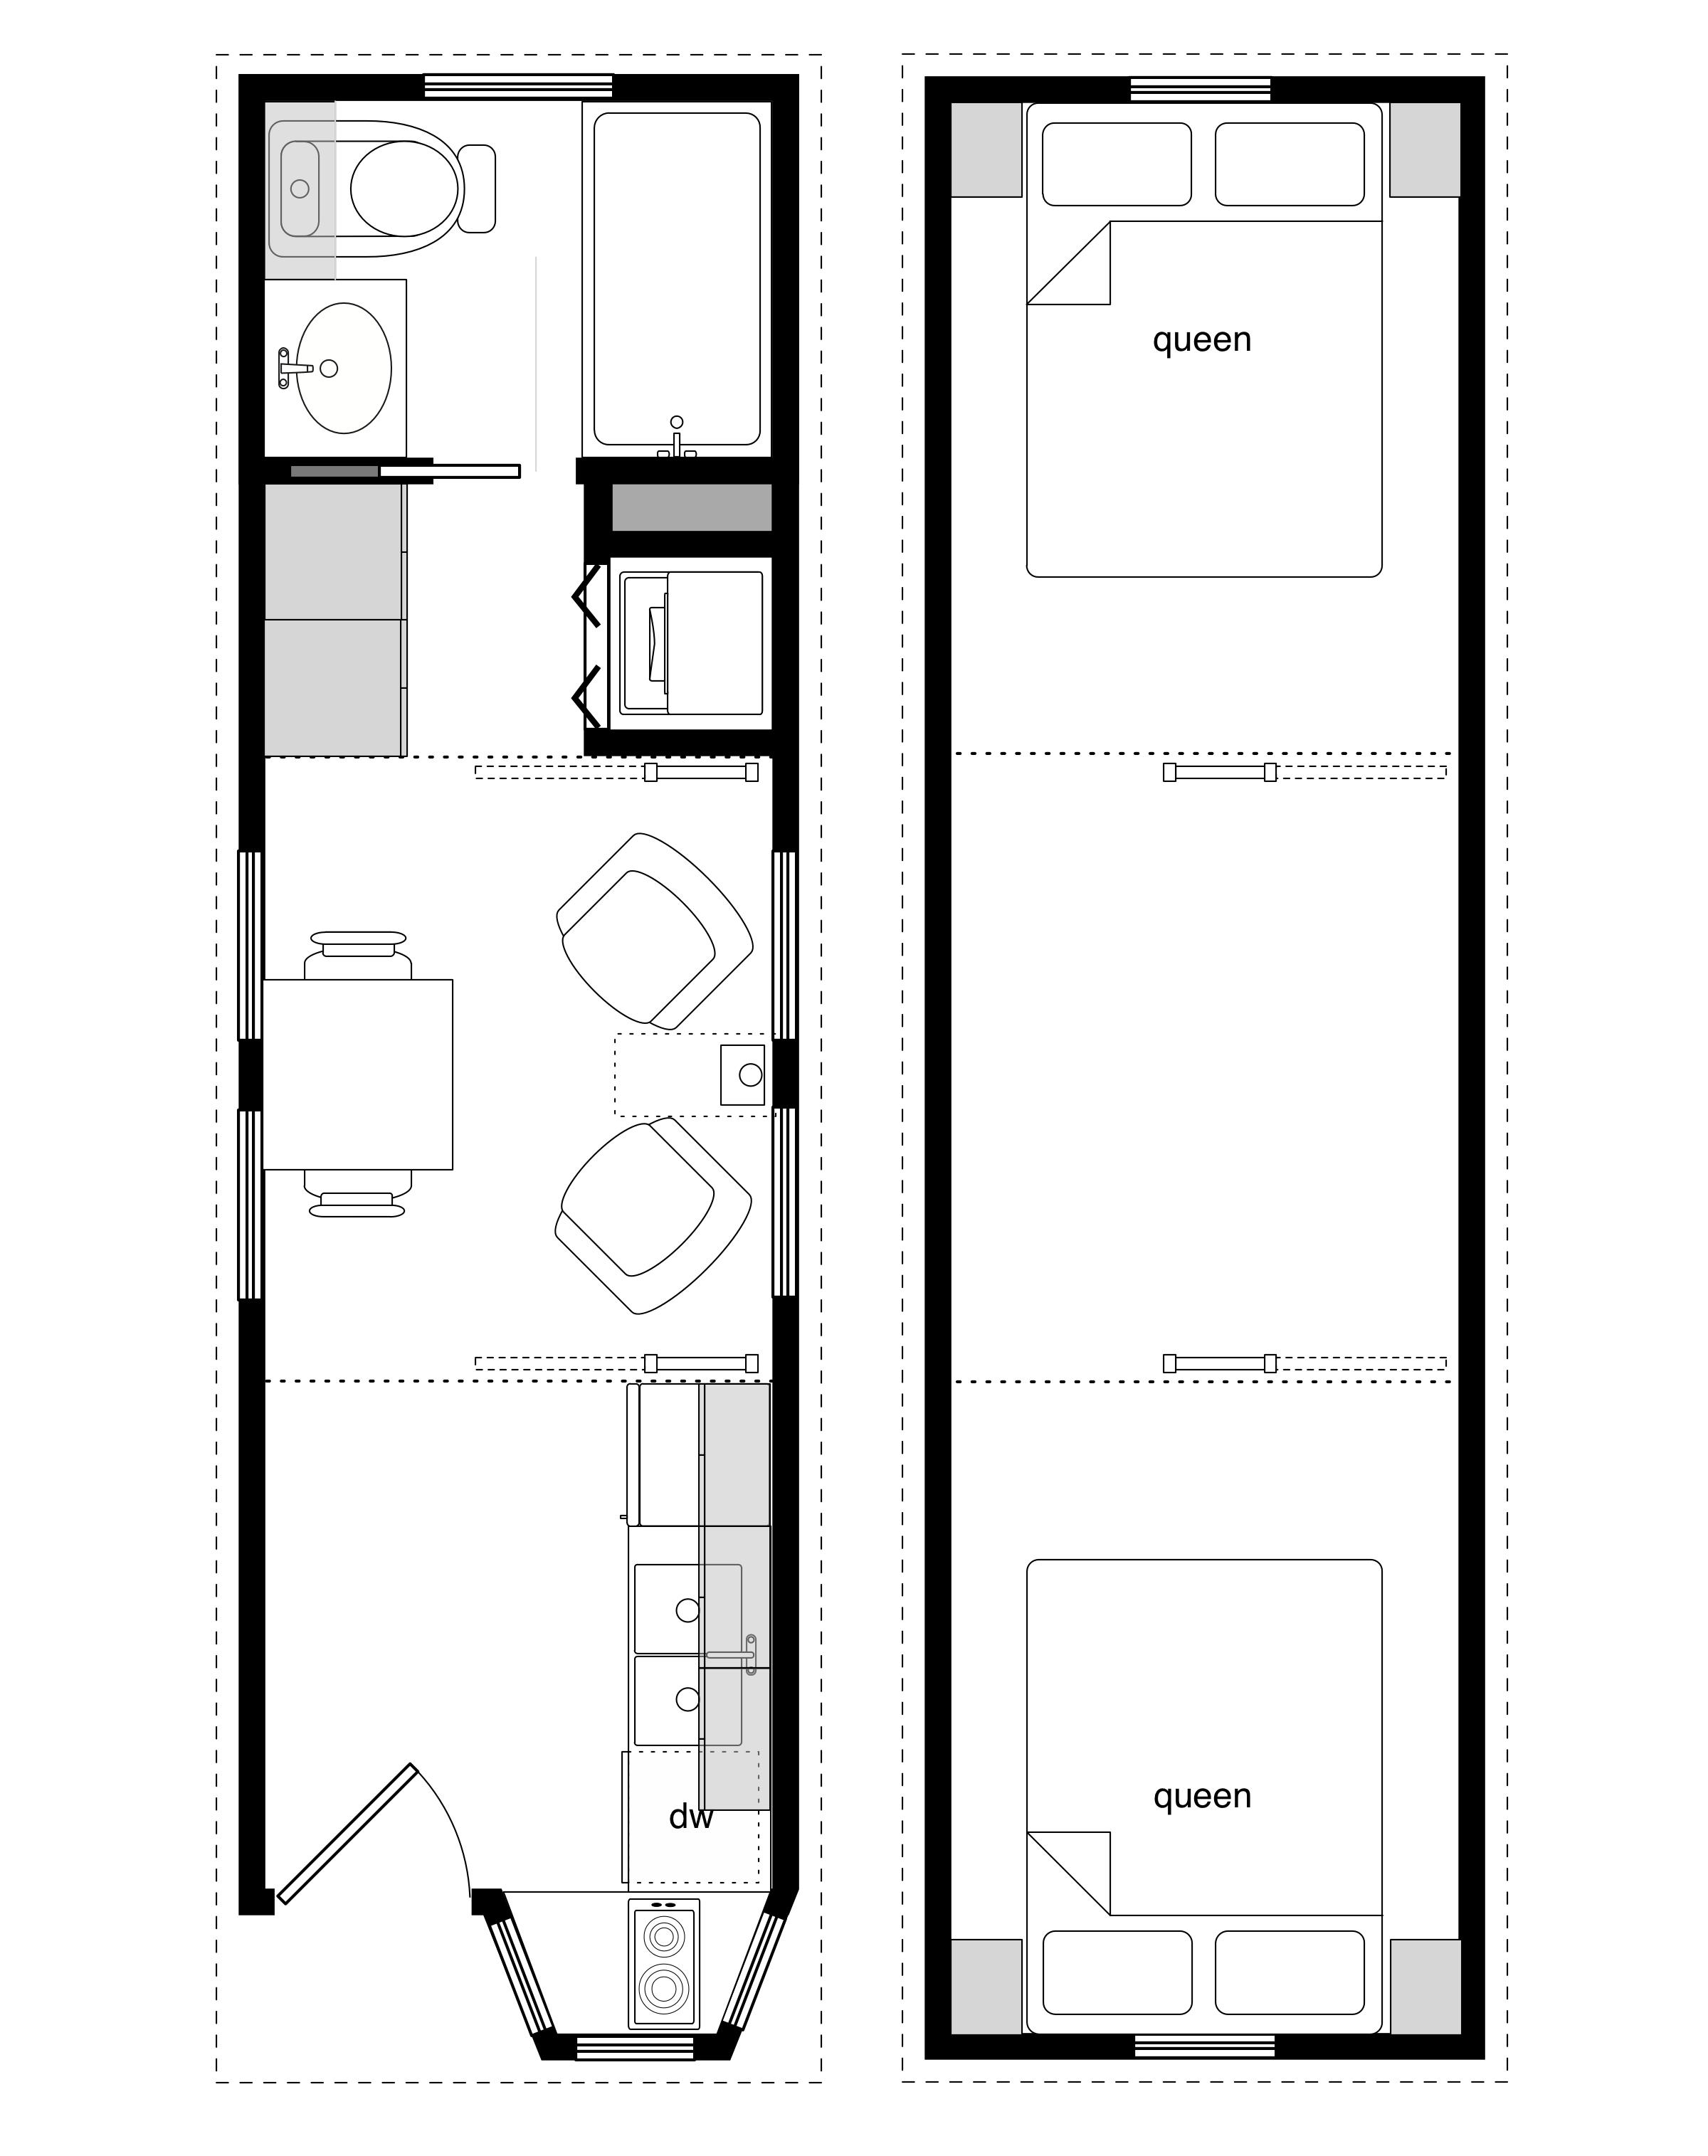 Brilliant 63 Best Ideas About Tiny Home Floor Plans On Pinterest Largest Home Design Picture Inspirations Pitcheantrous